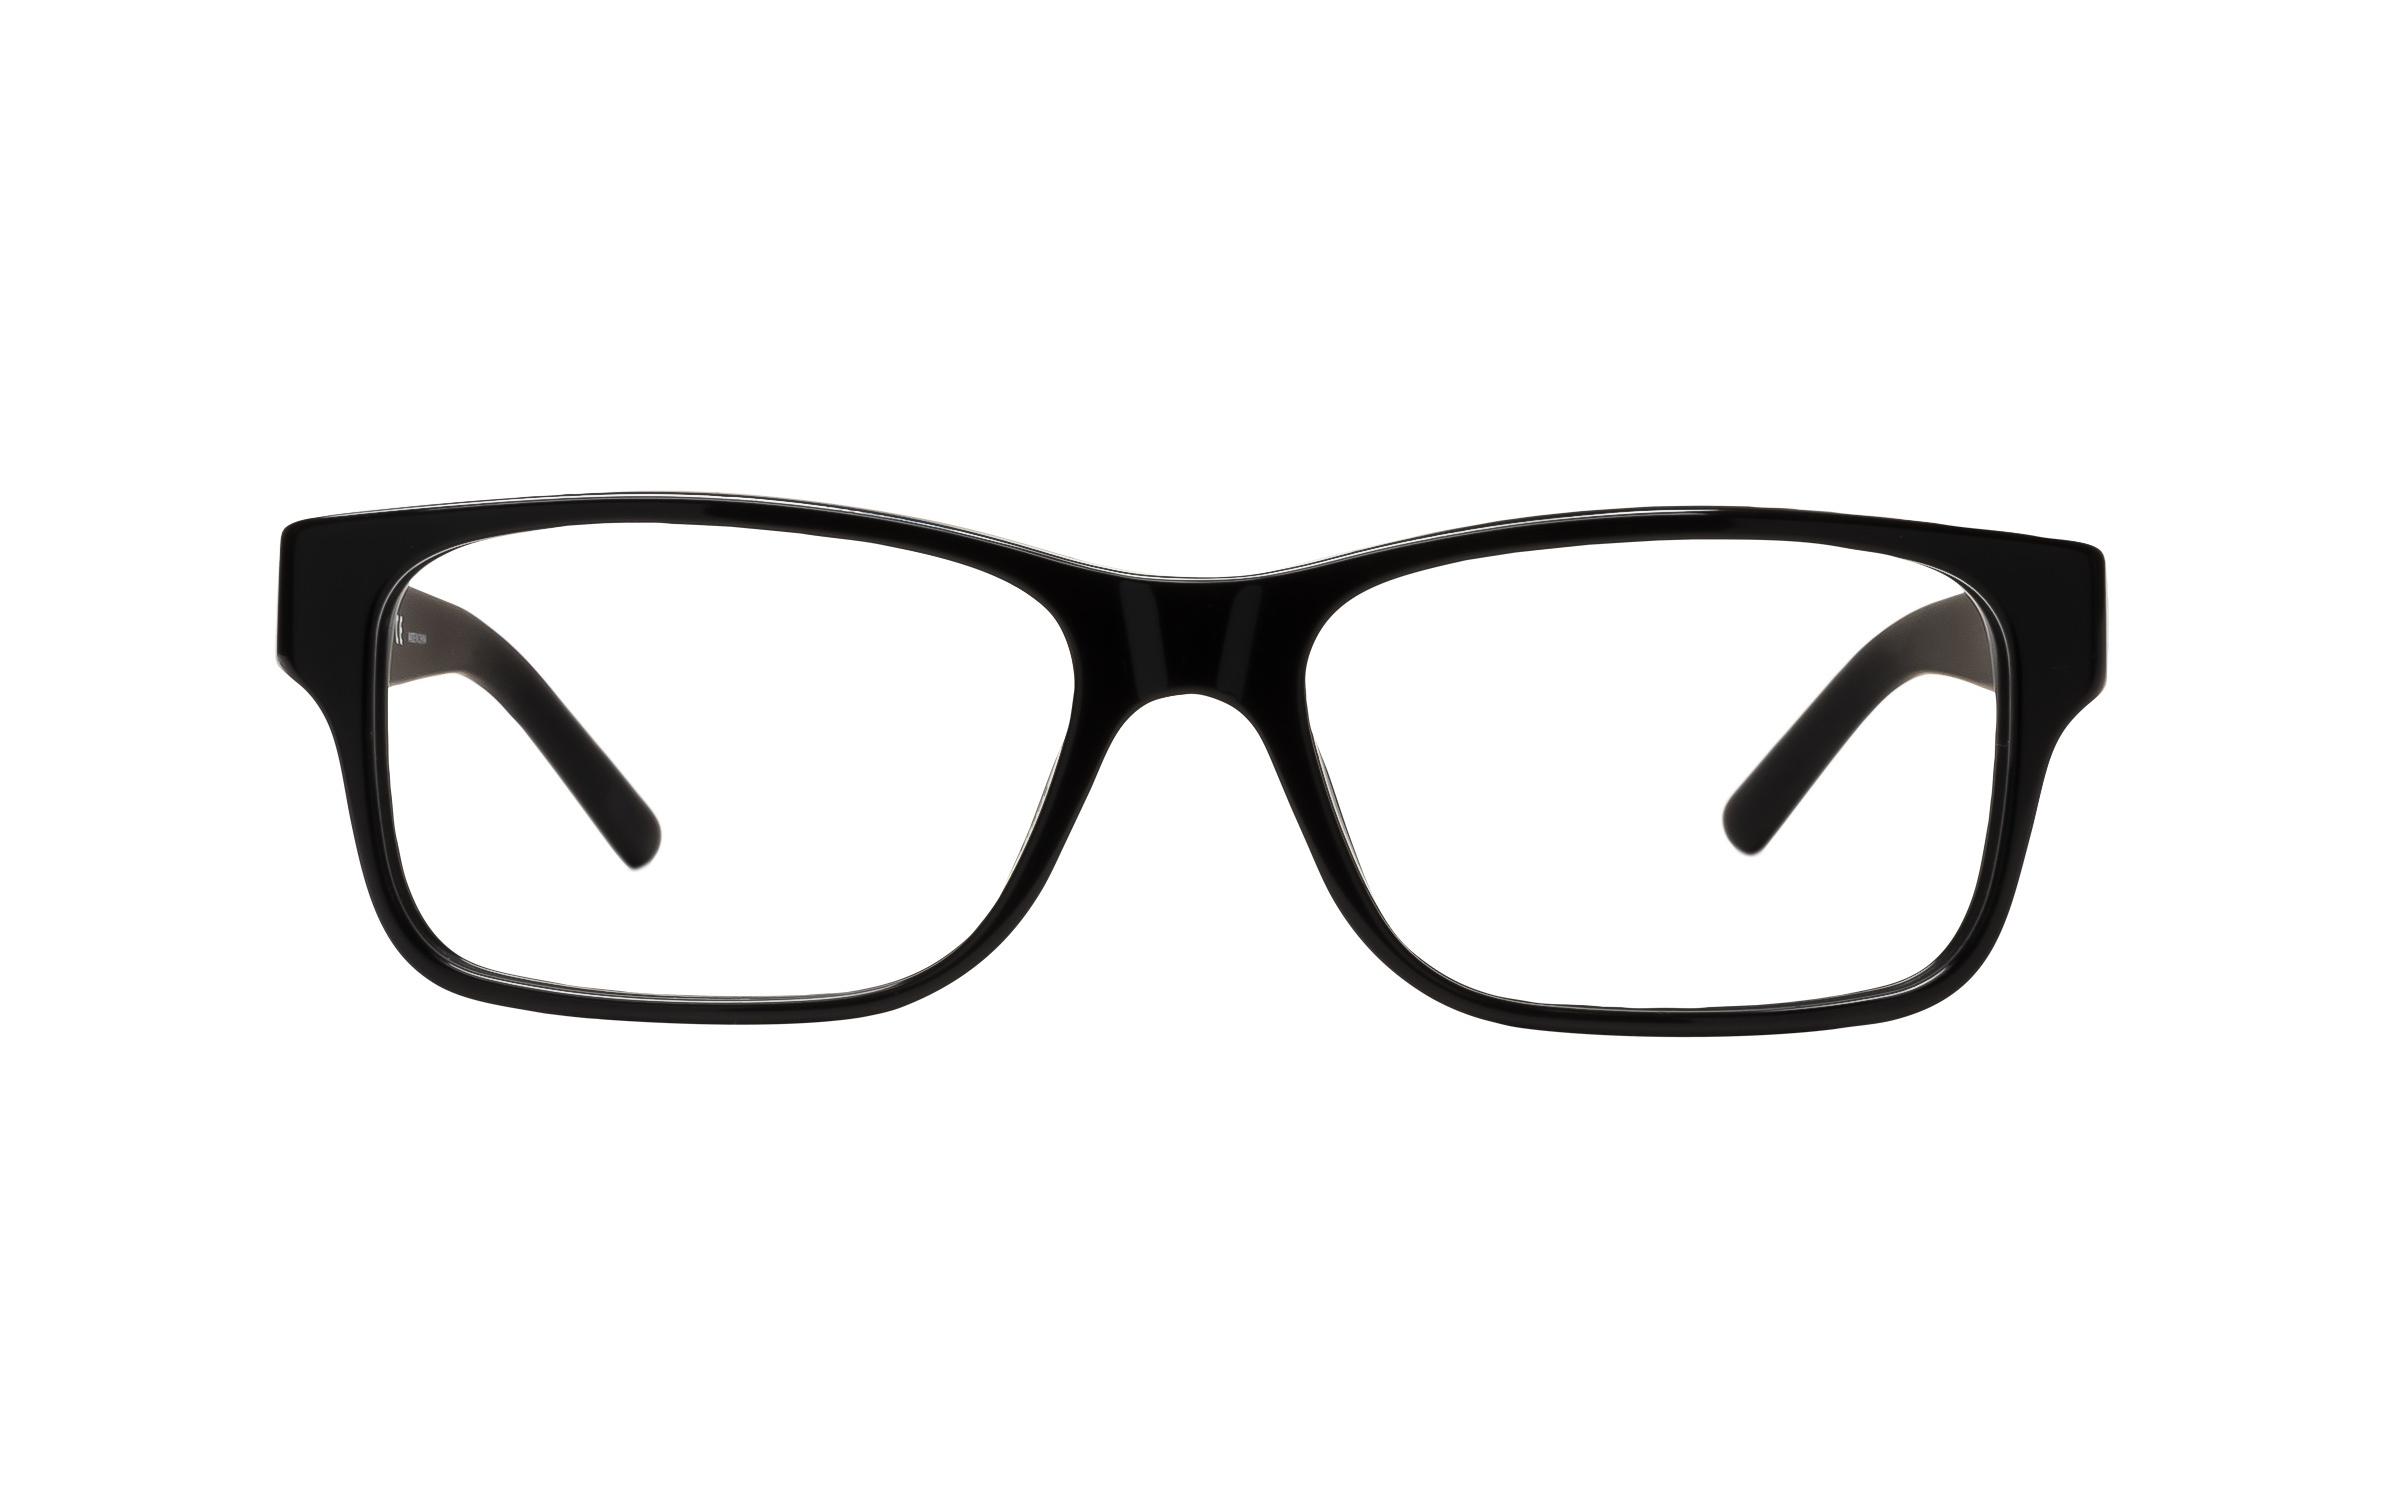 Luxottica Polo Ralph Lauren PH2117 5001 (54) Eyeglasses and Frame in Shiny Black - Online Coastal